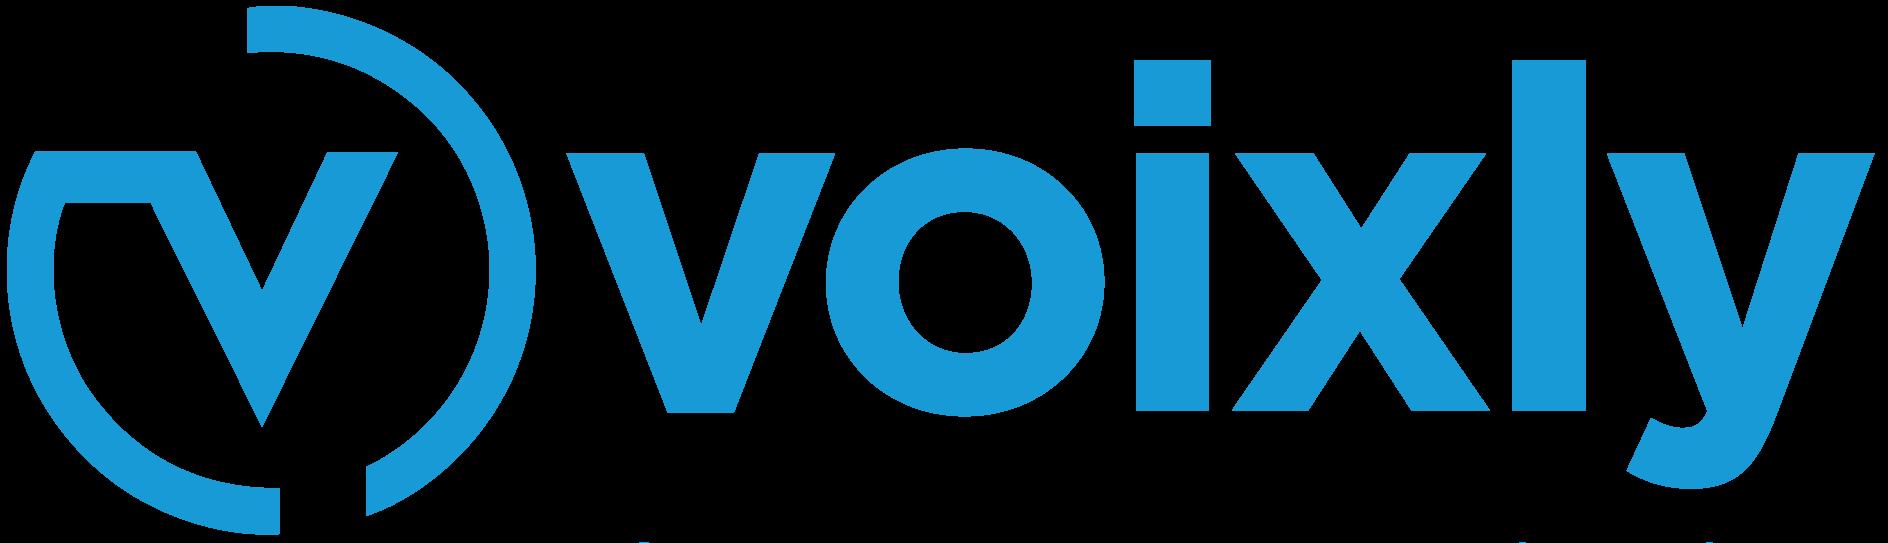 new voixly logo